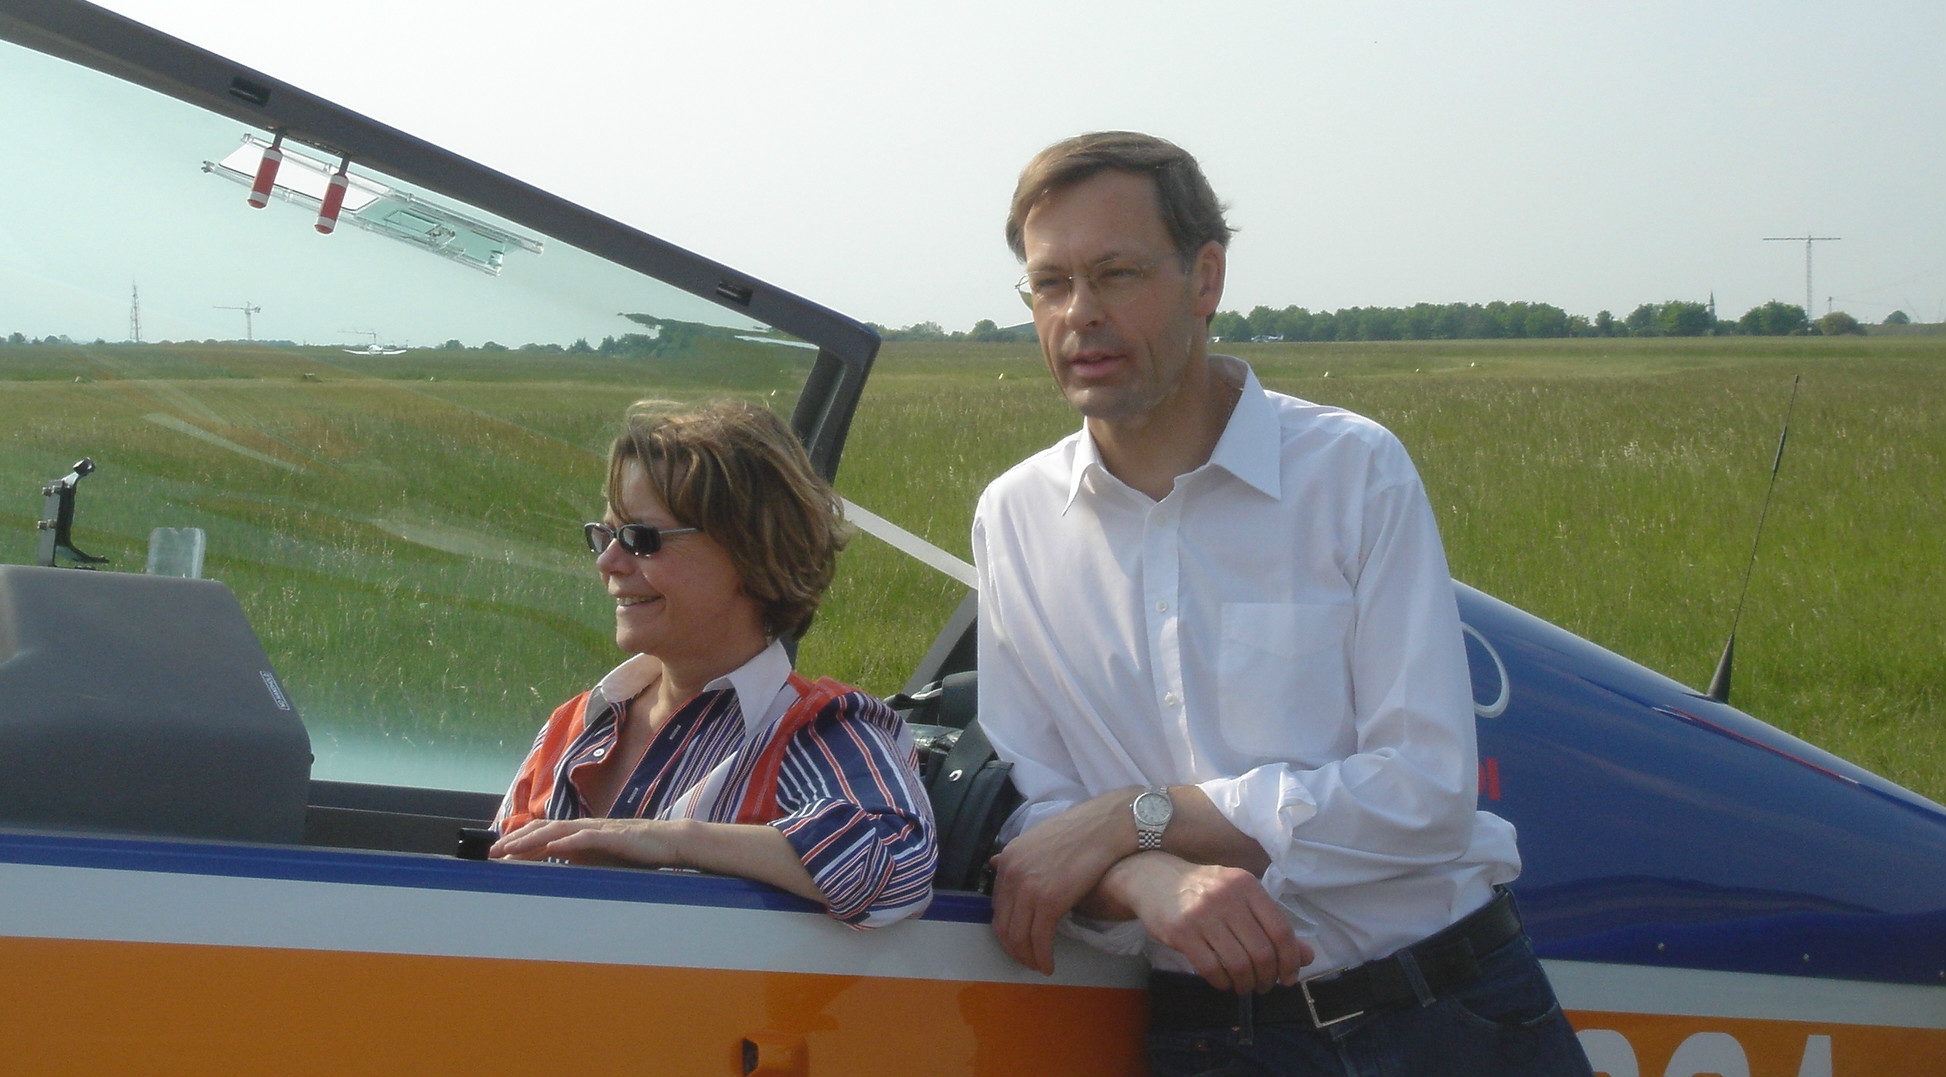 Jacques Arnould & Catherine Maunoury